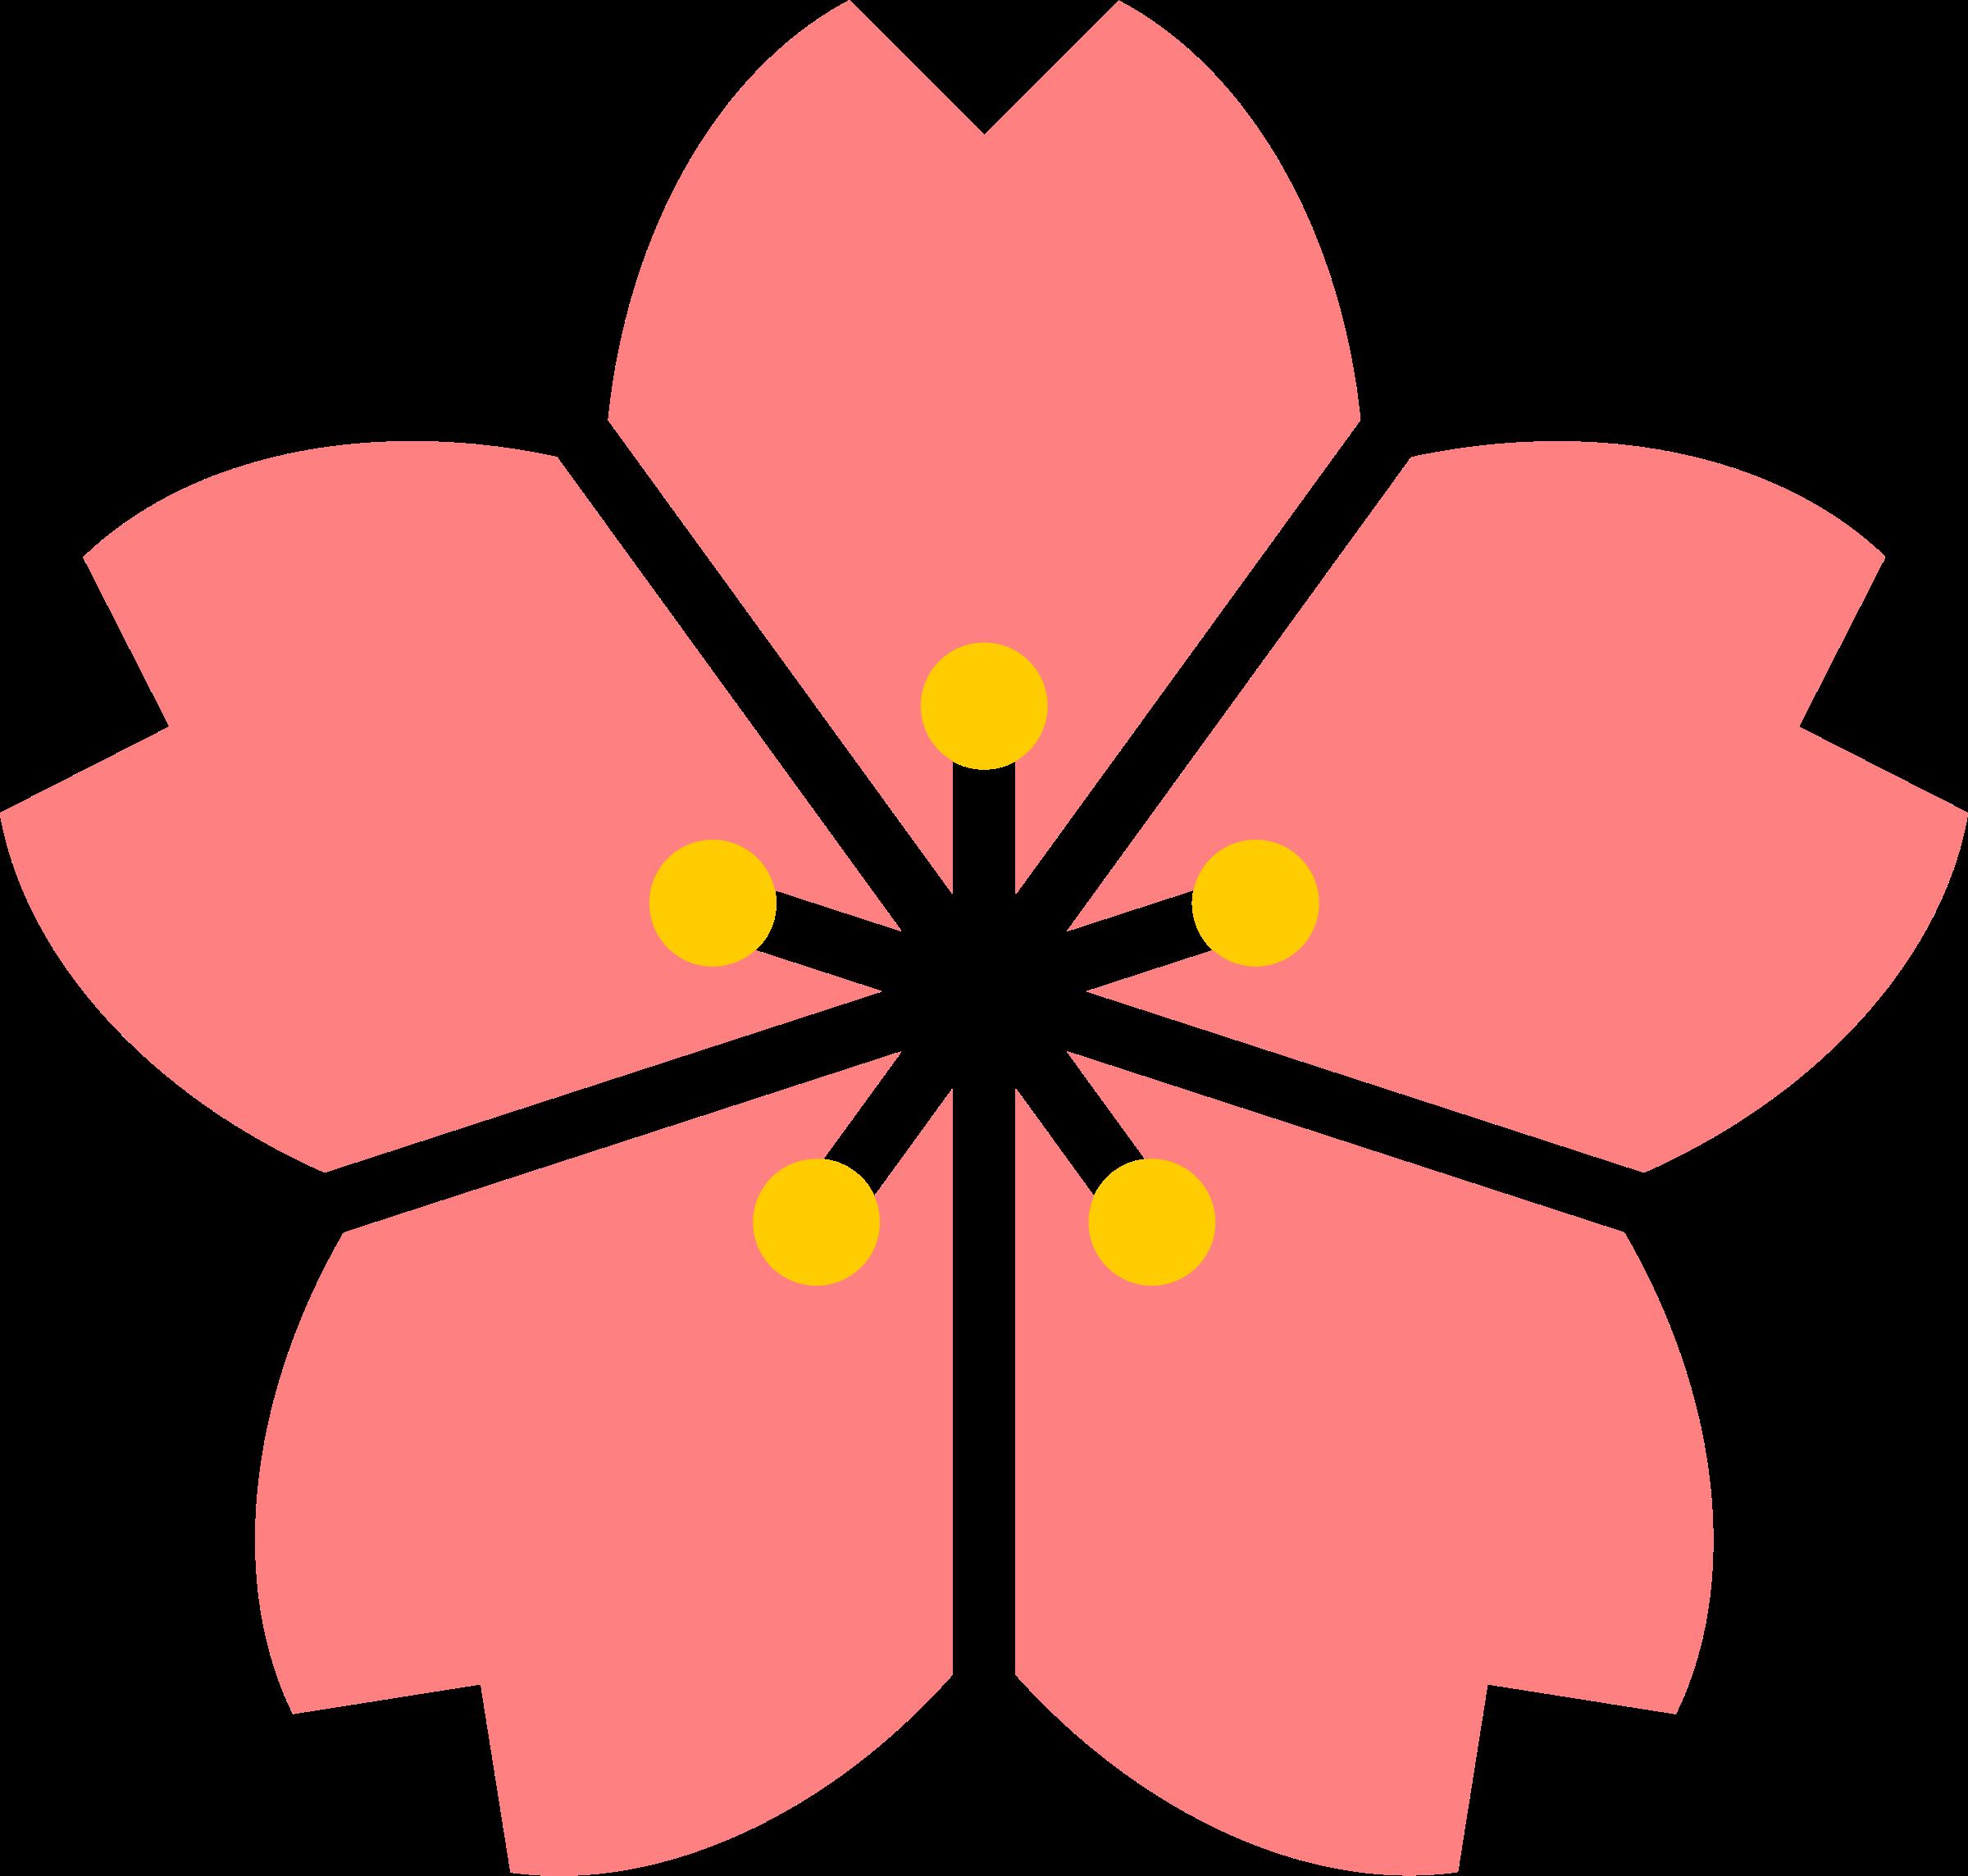 Sakura Blossom svg #7, Download drawings